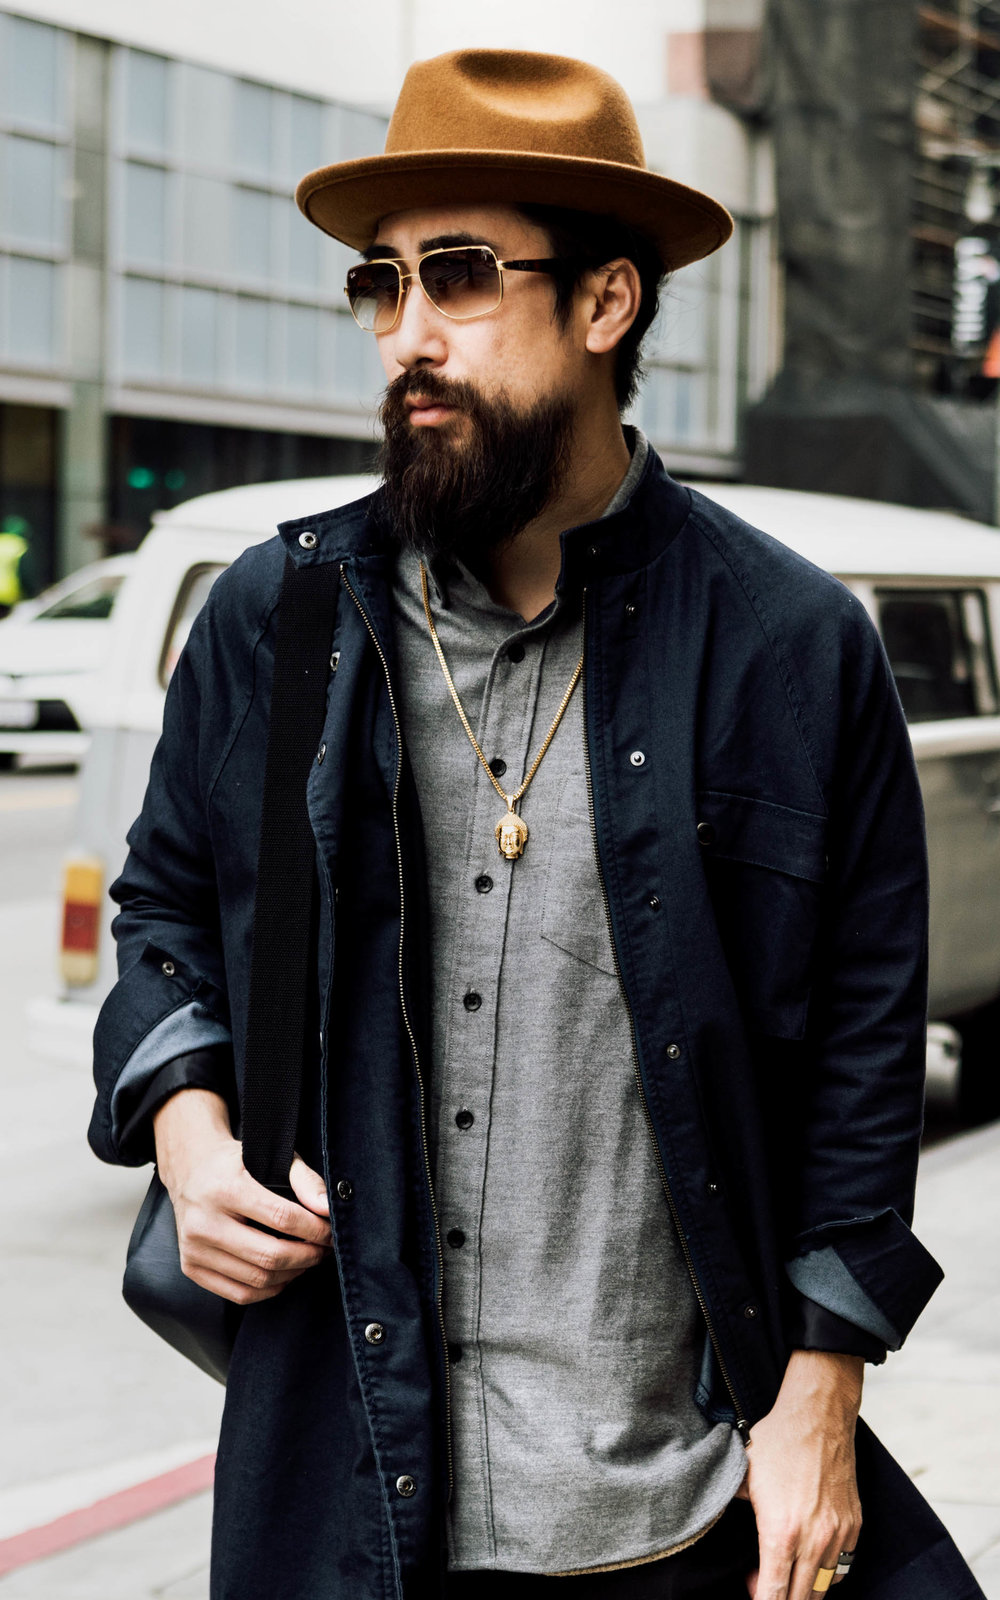 justfeng ryan feng hipster beard asian ootdmen menstyle streetstyle streetfashion los angeles beard